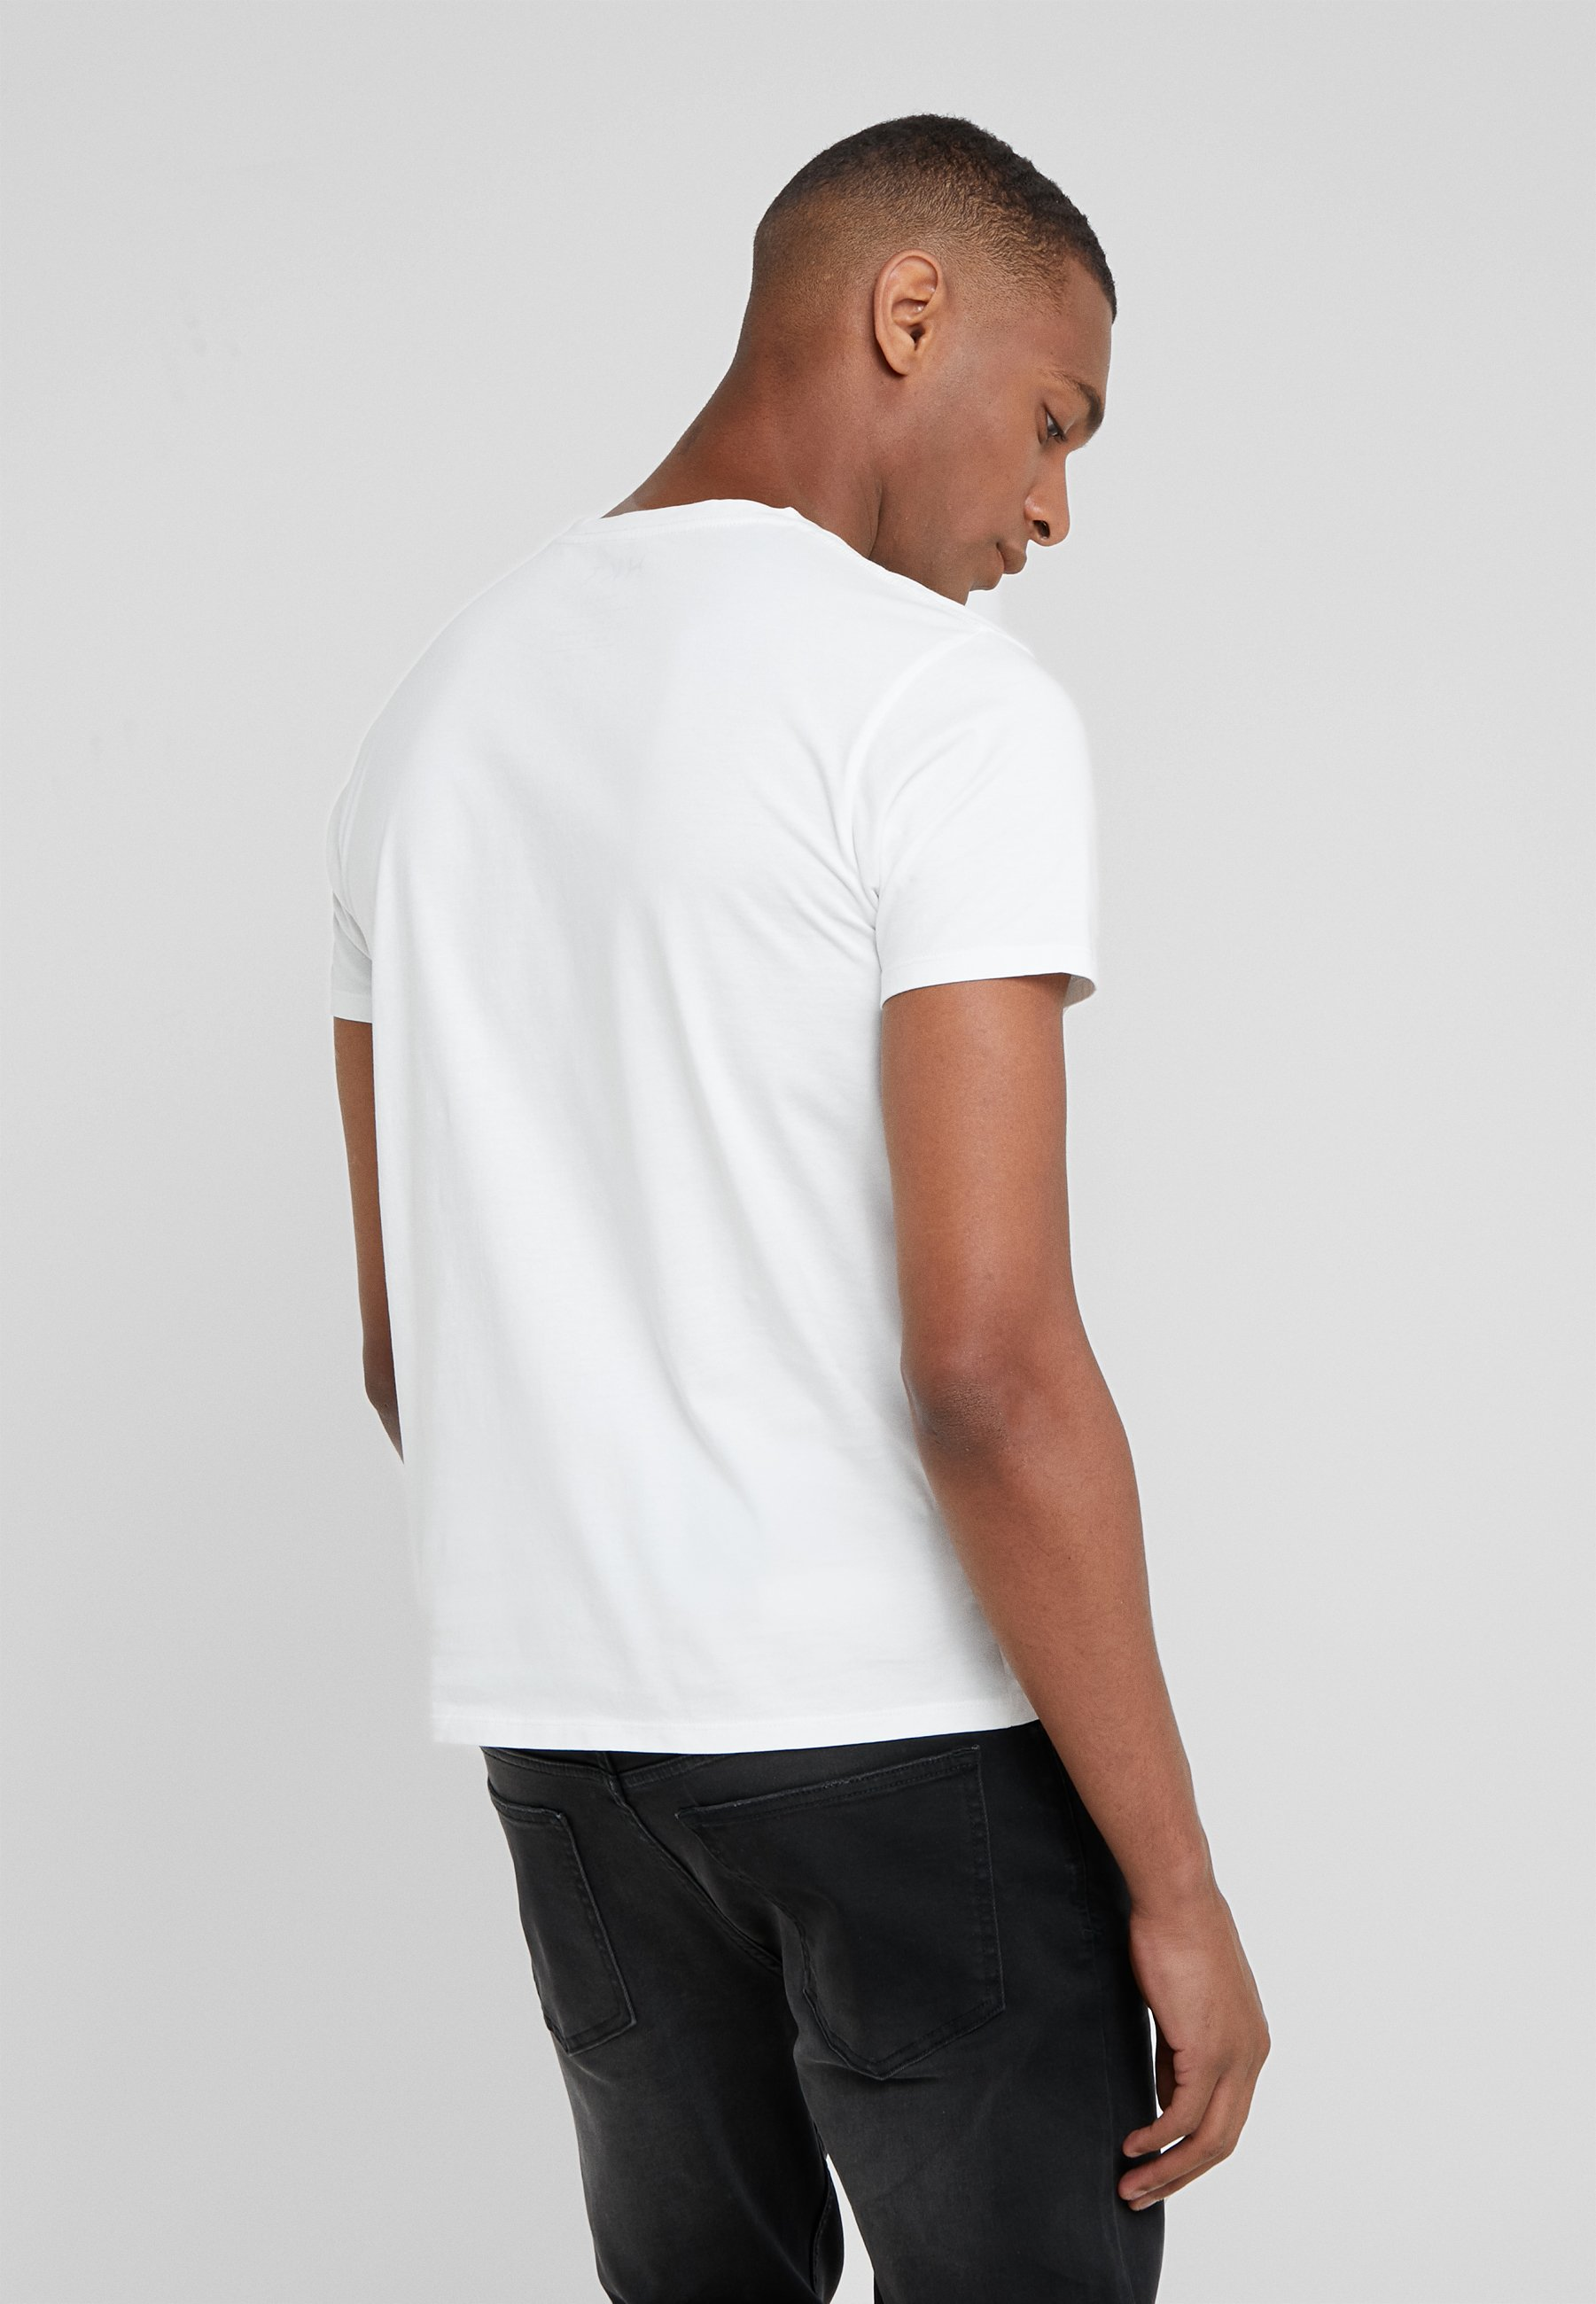 Hkt White ThrillsT Imprimé shirt By Hackett WdBorxeC